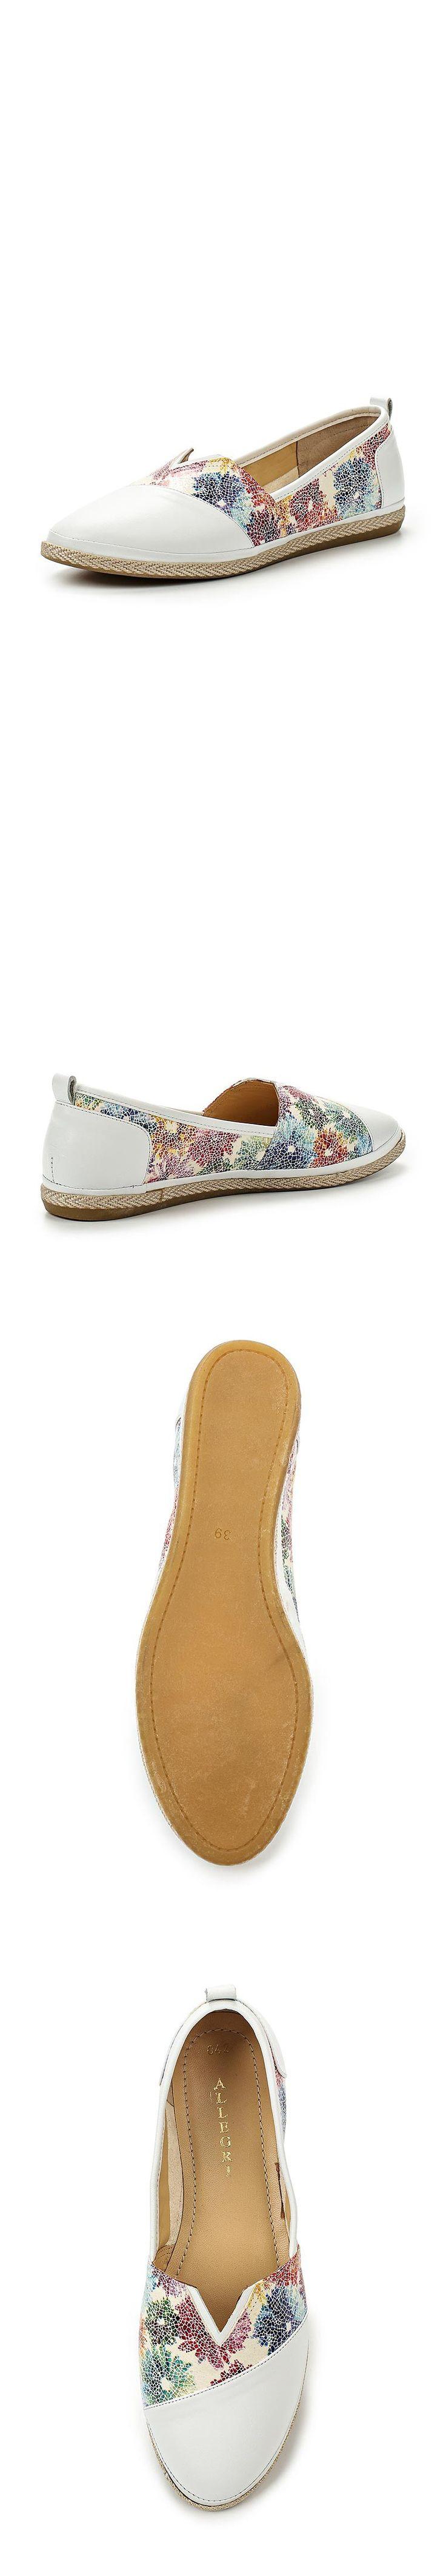 Женская обувь эспадрильи Allegri за 8360.00 руб.